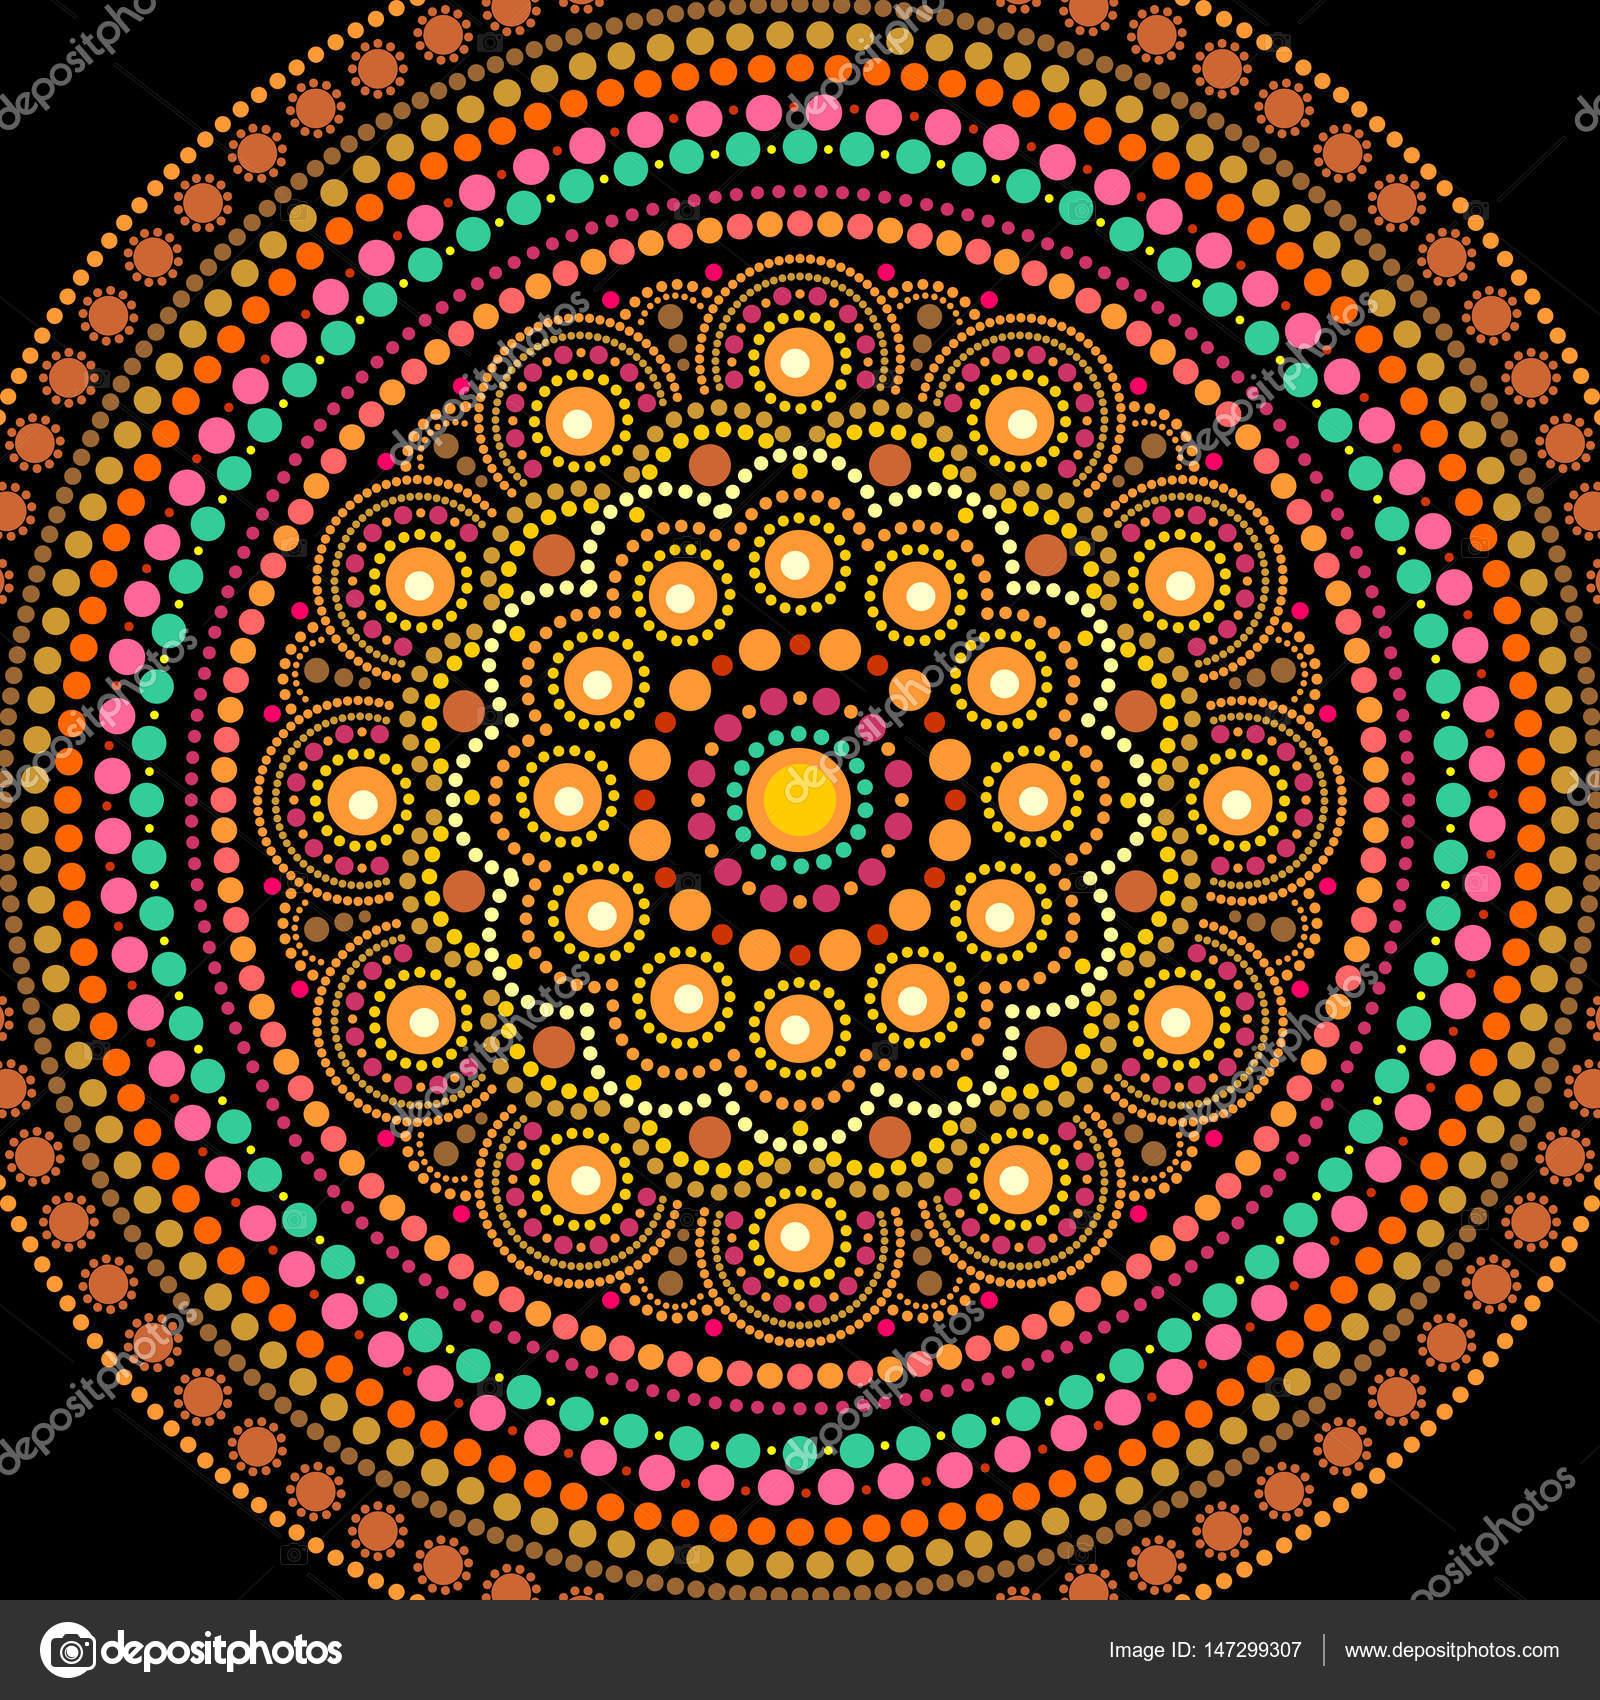 Pinturas De Mandalas Mandala De Pintura Punto De Estilo Aborigen - Pinturas-de-mandalas